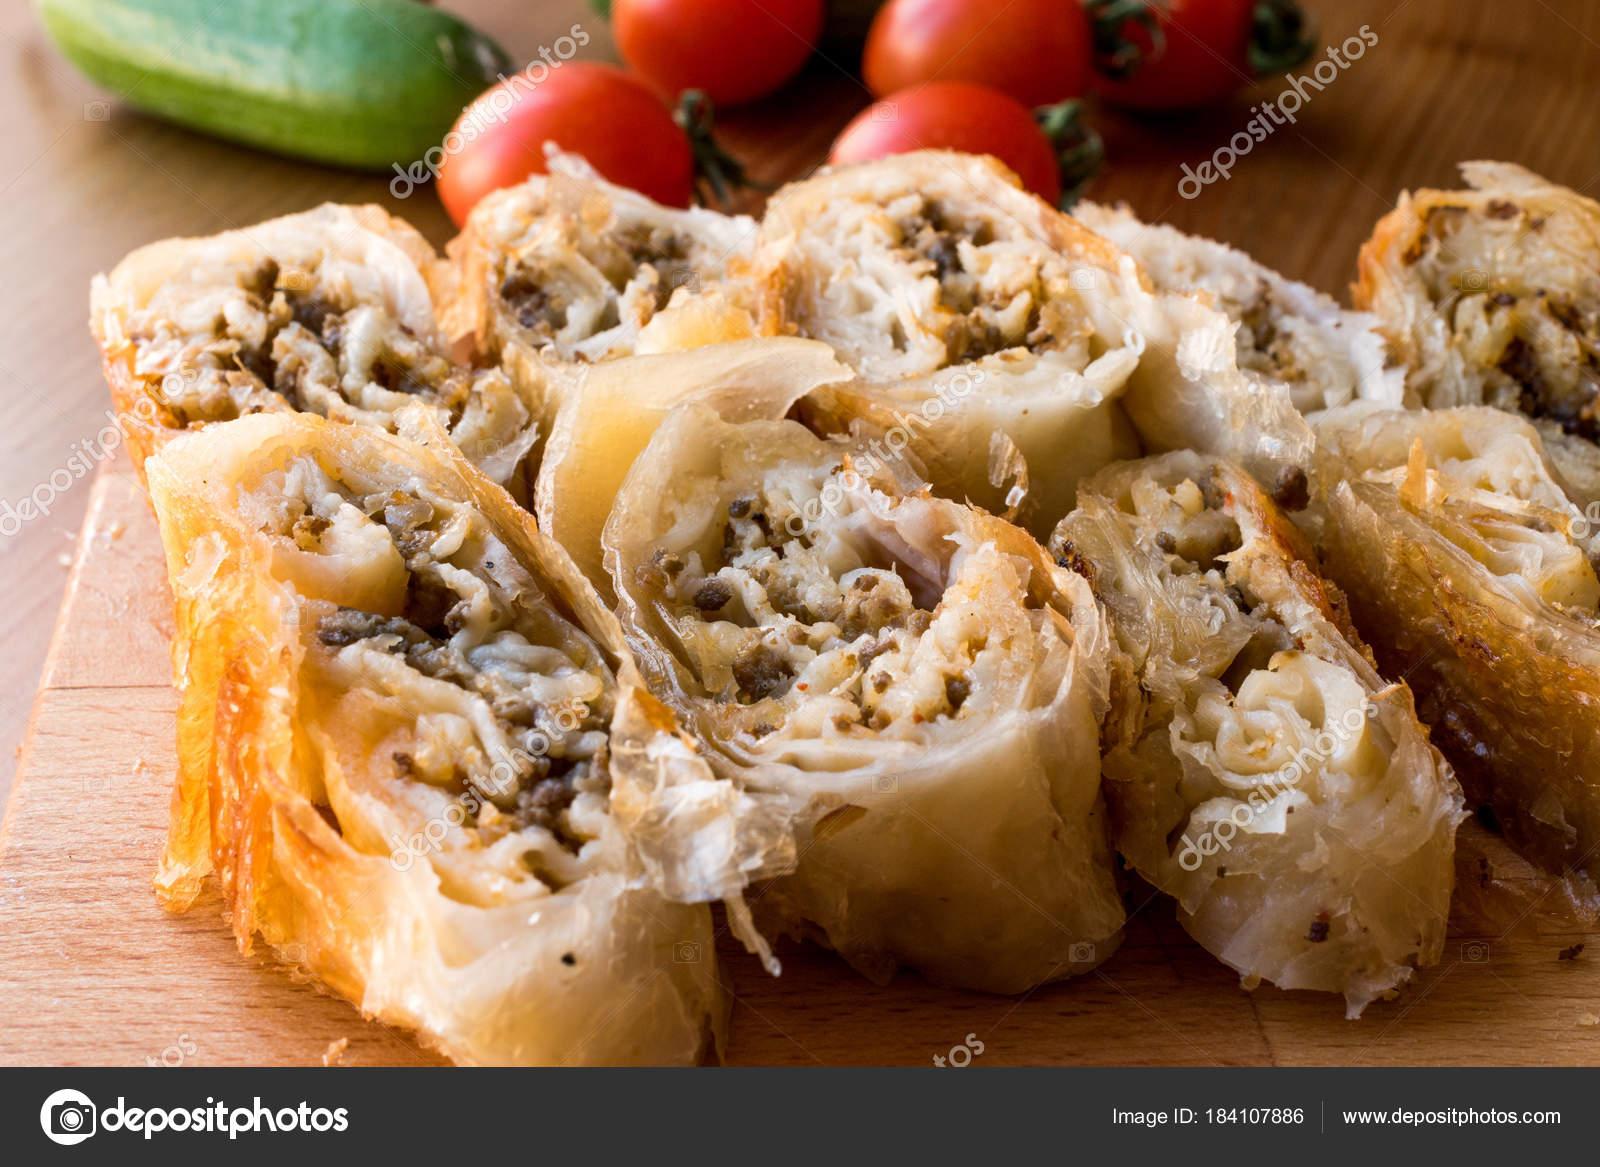 Borek turco kol boregi con carne picada fotos de stock alpaksoy borek turco kol boregi con carne picada fotos de stock forumfinder Images